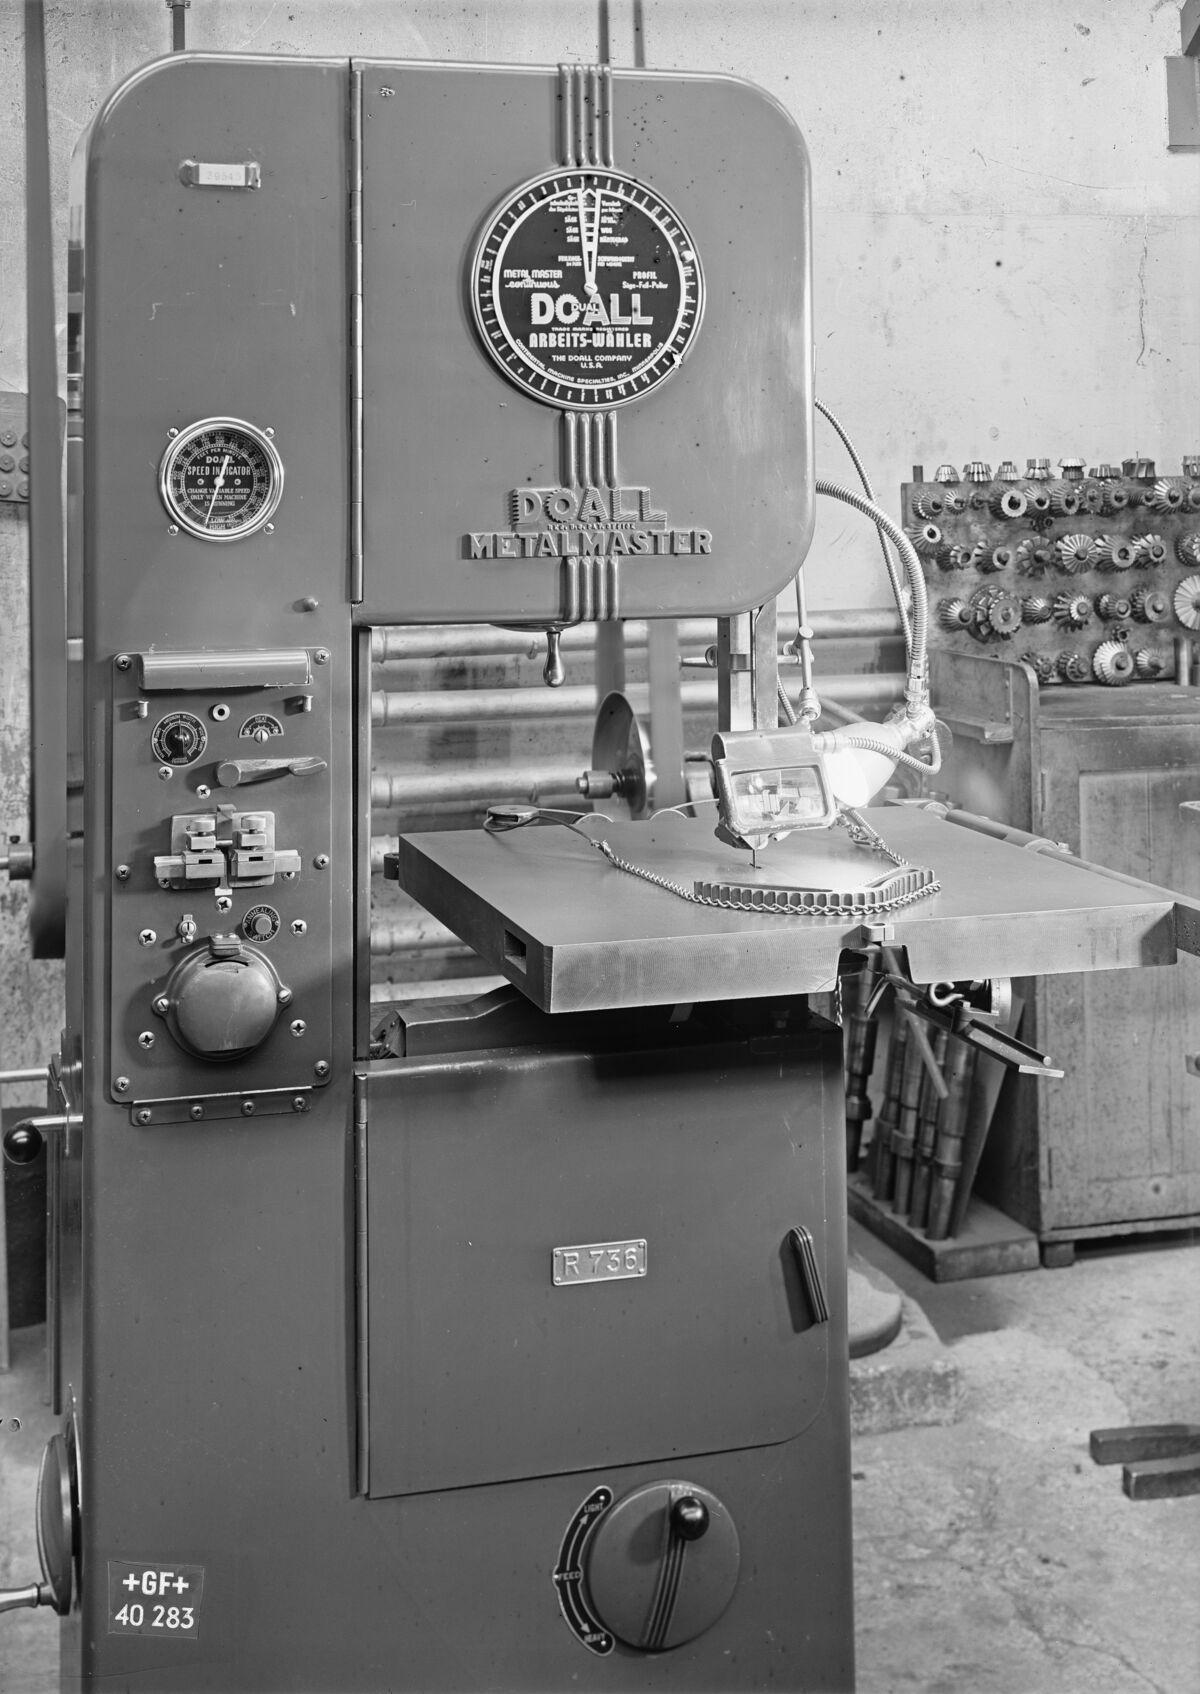 GFA 16/40283: Doall Metalmaster